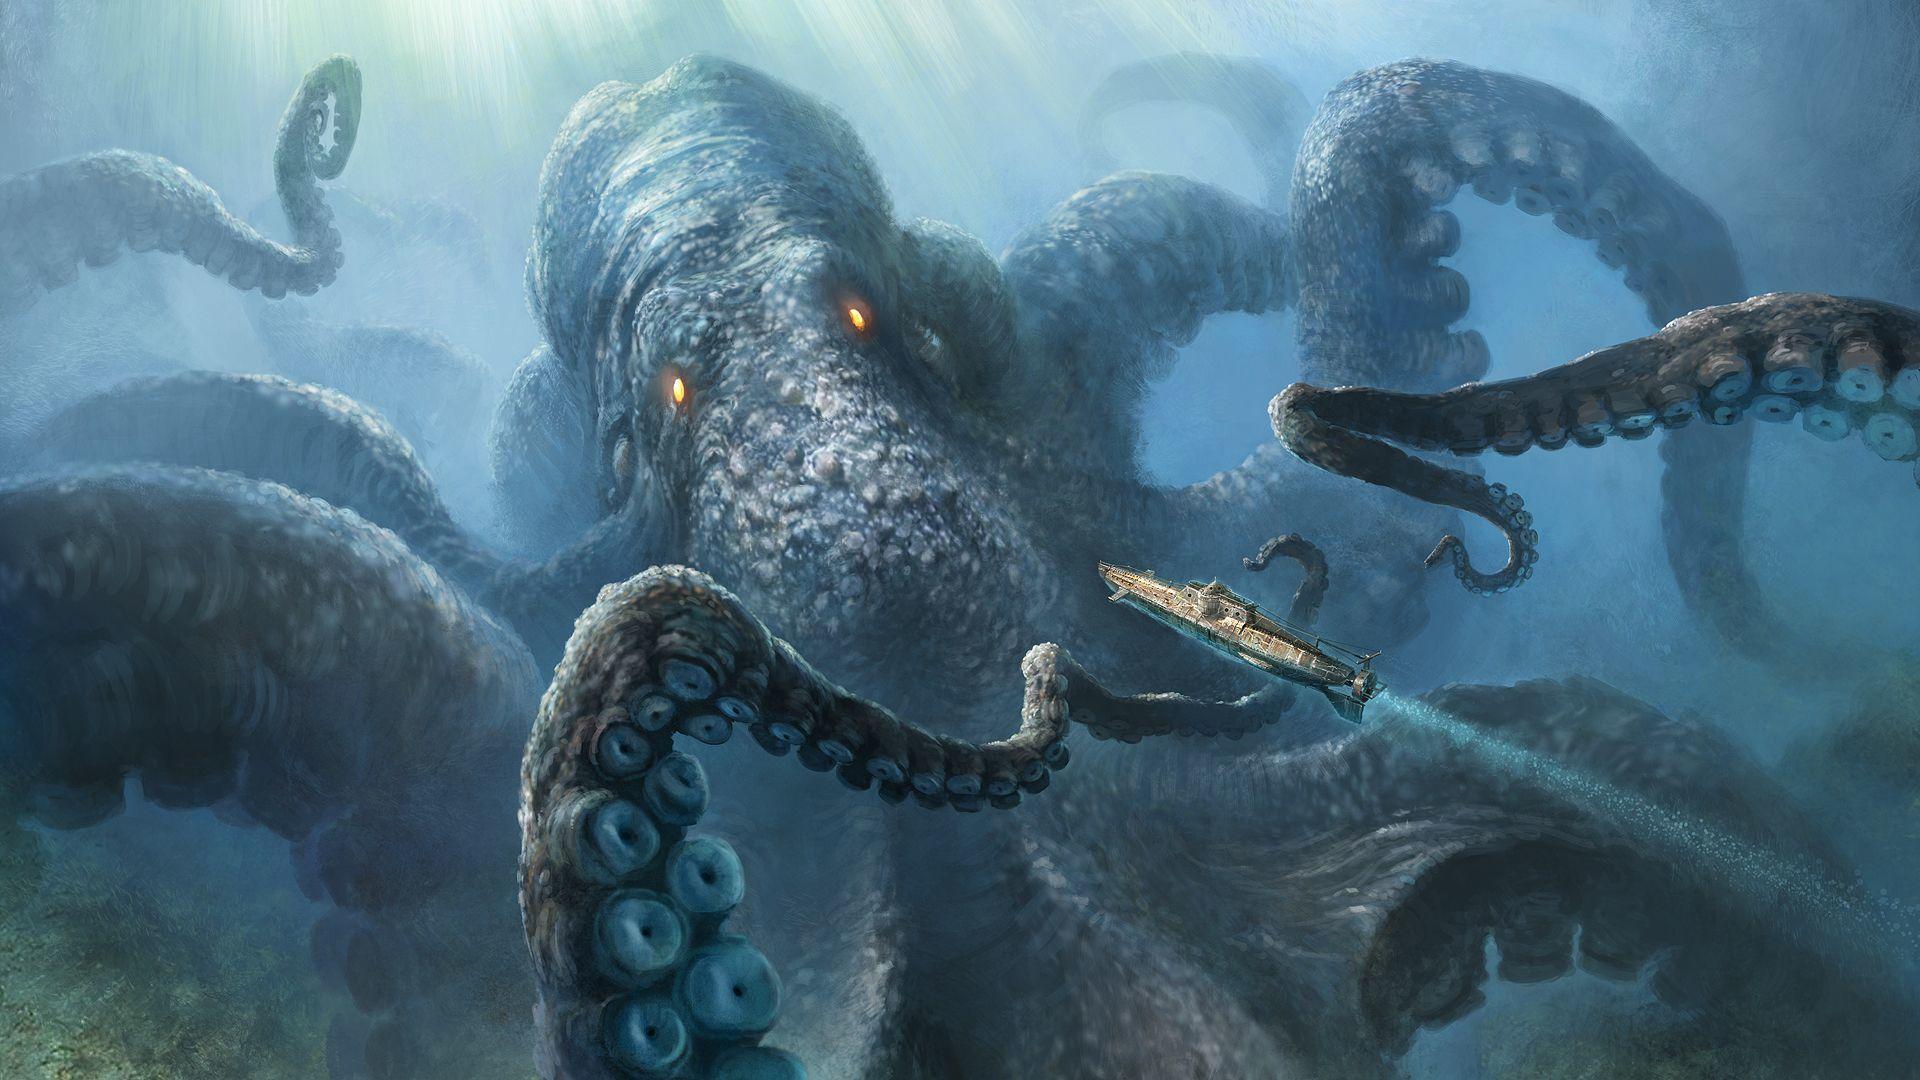 HQ Kraken Wallpapers | File 235.78Kb